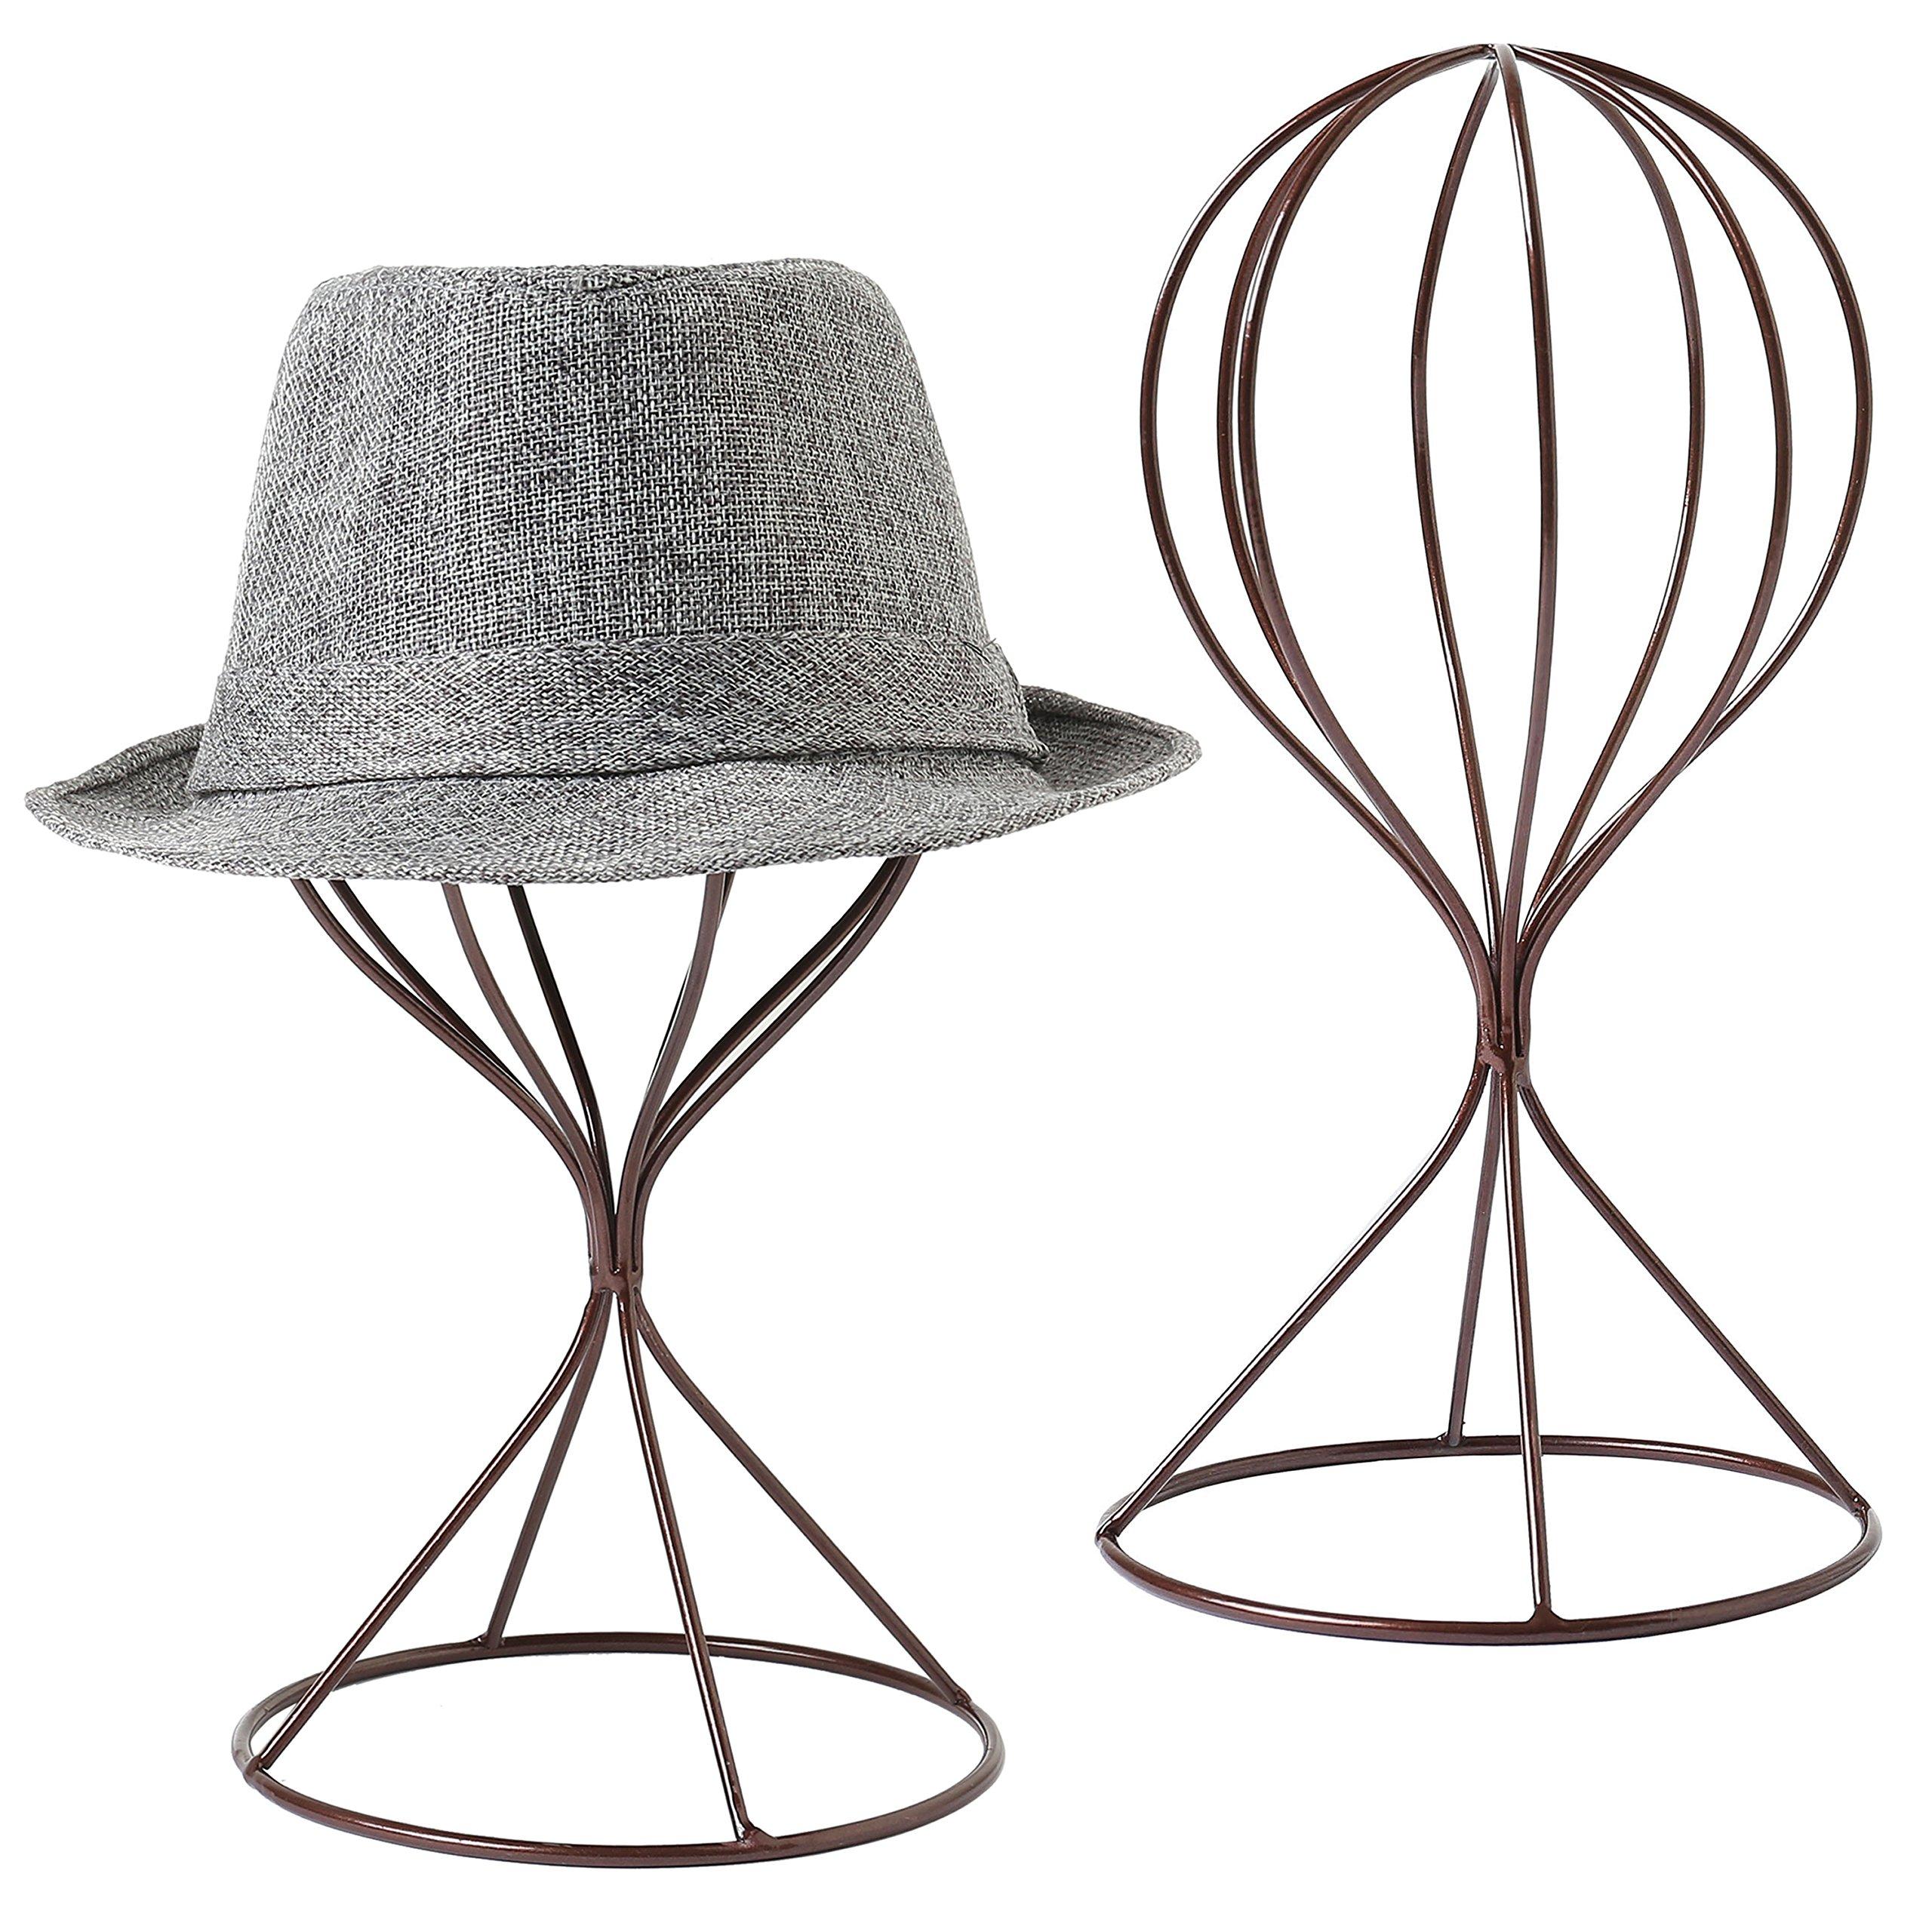 MyGift Modern Metal Hat Stands, Tabletop Decorative Wig Holders, Set of 2, Brown